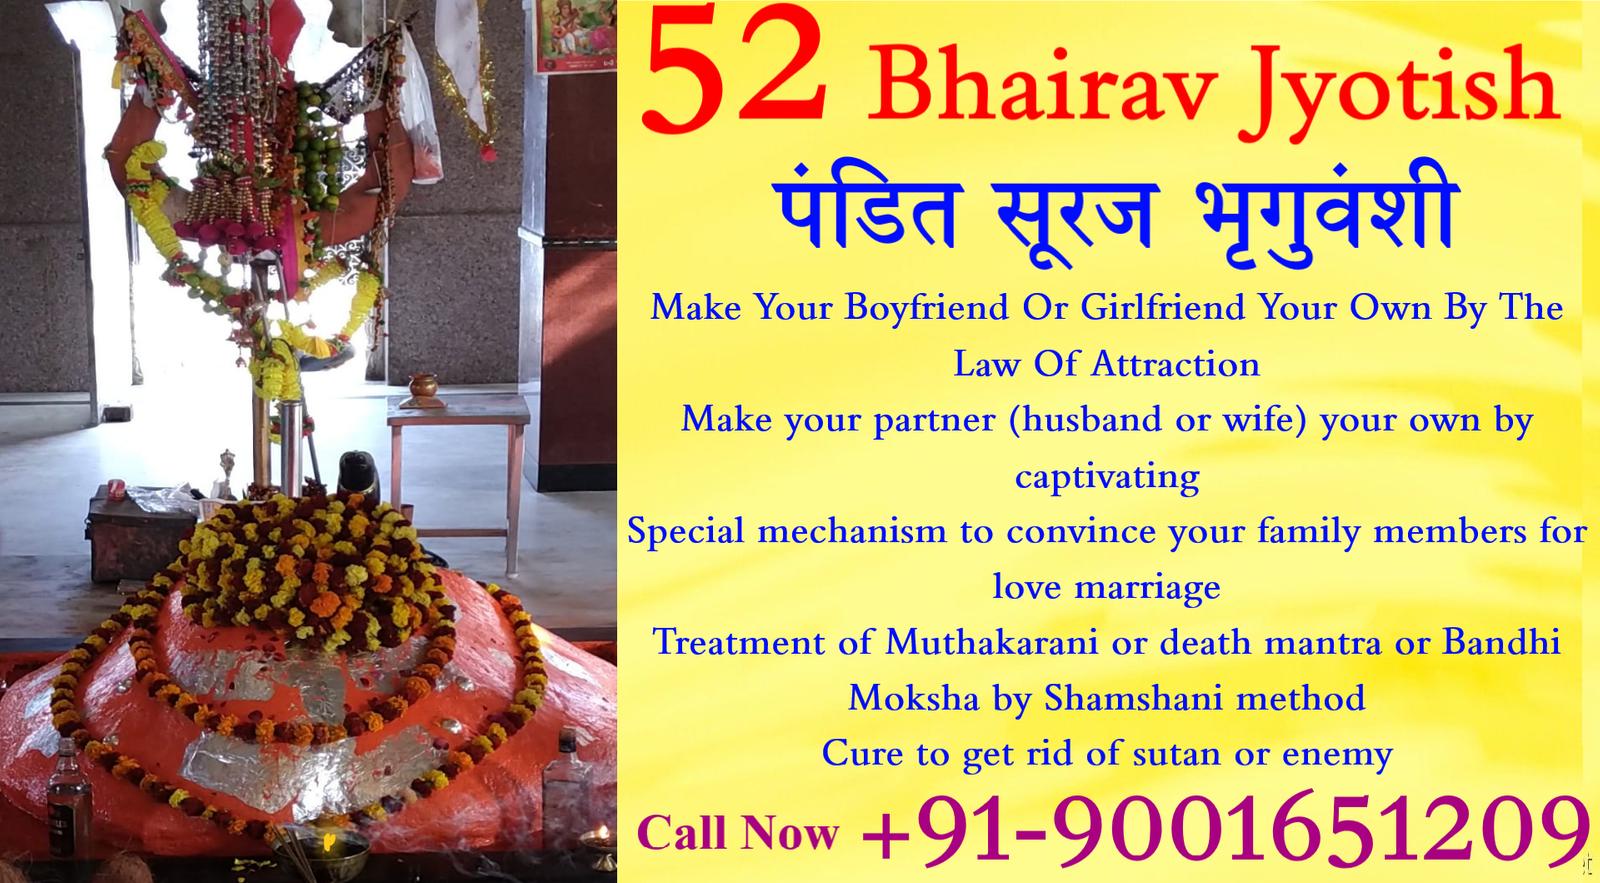 Mantra to make husband come back